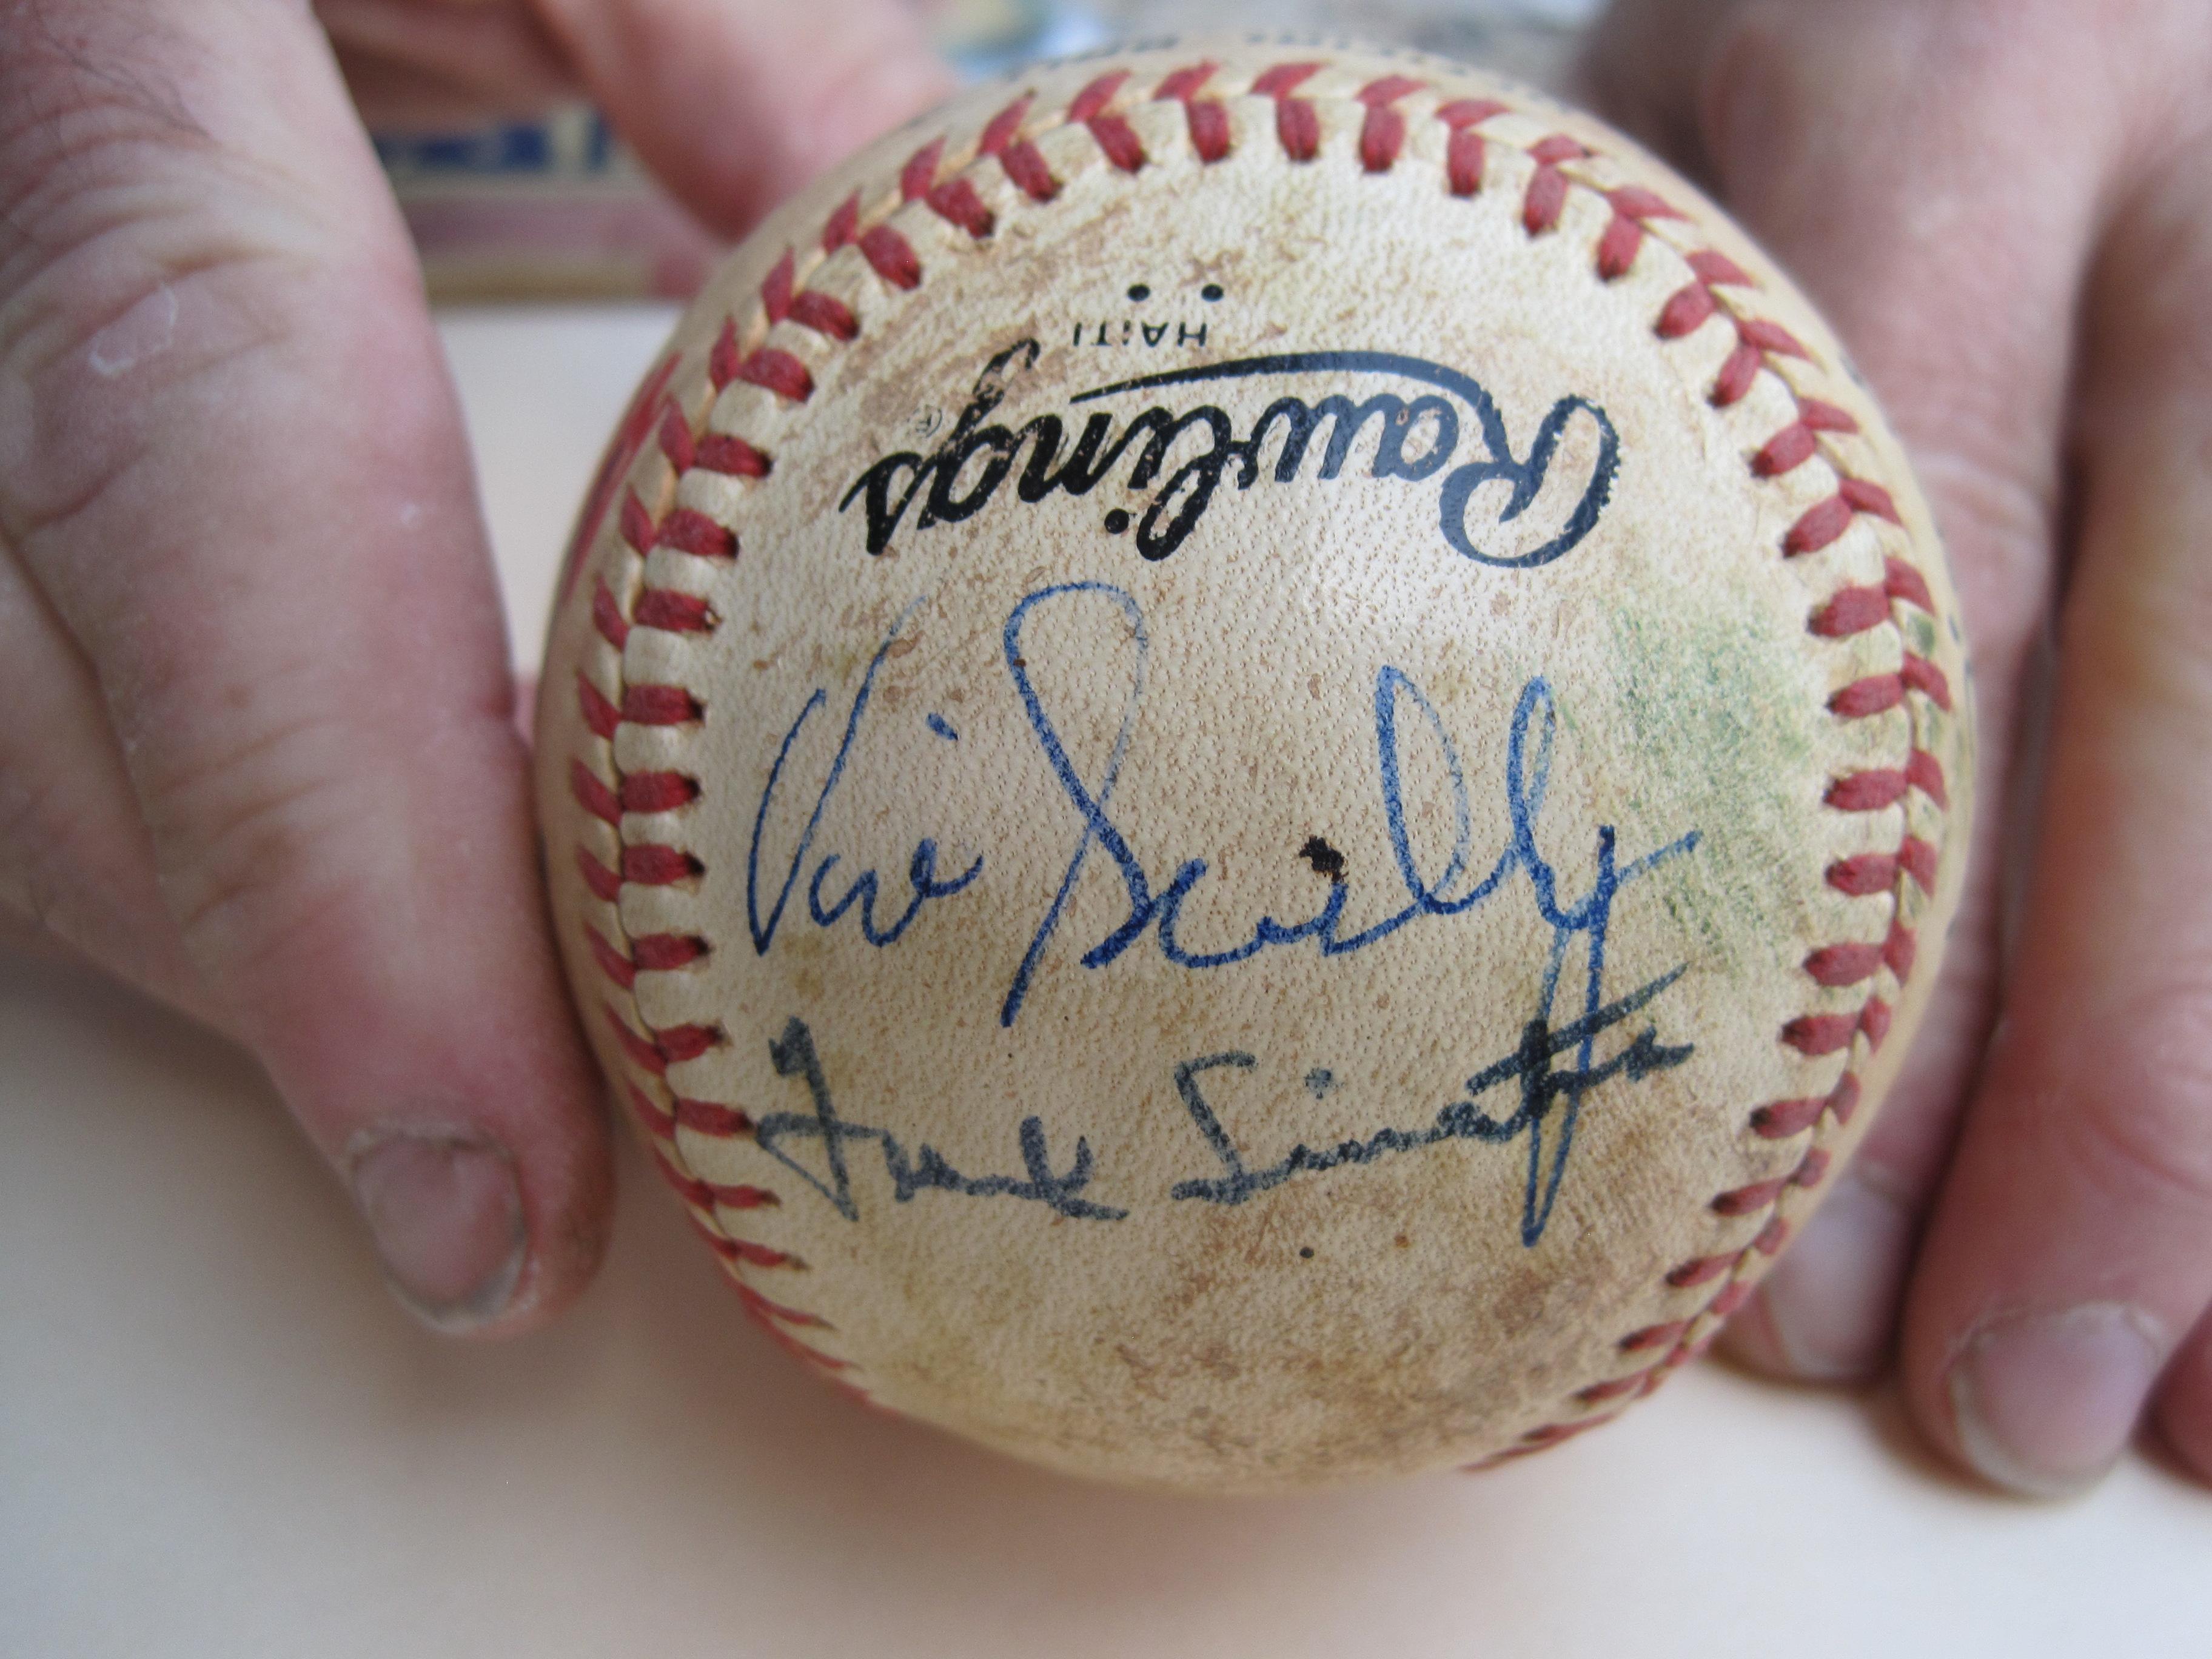 Frank Sinatra signed baseball